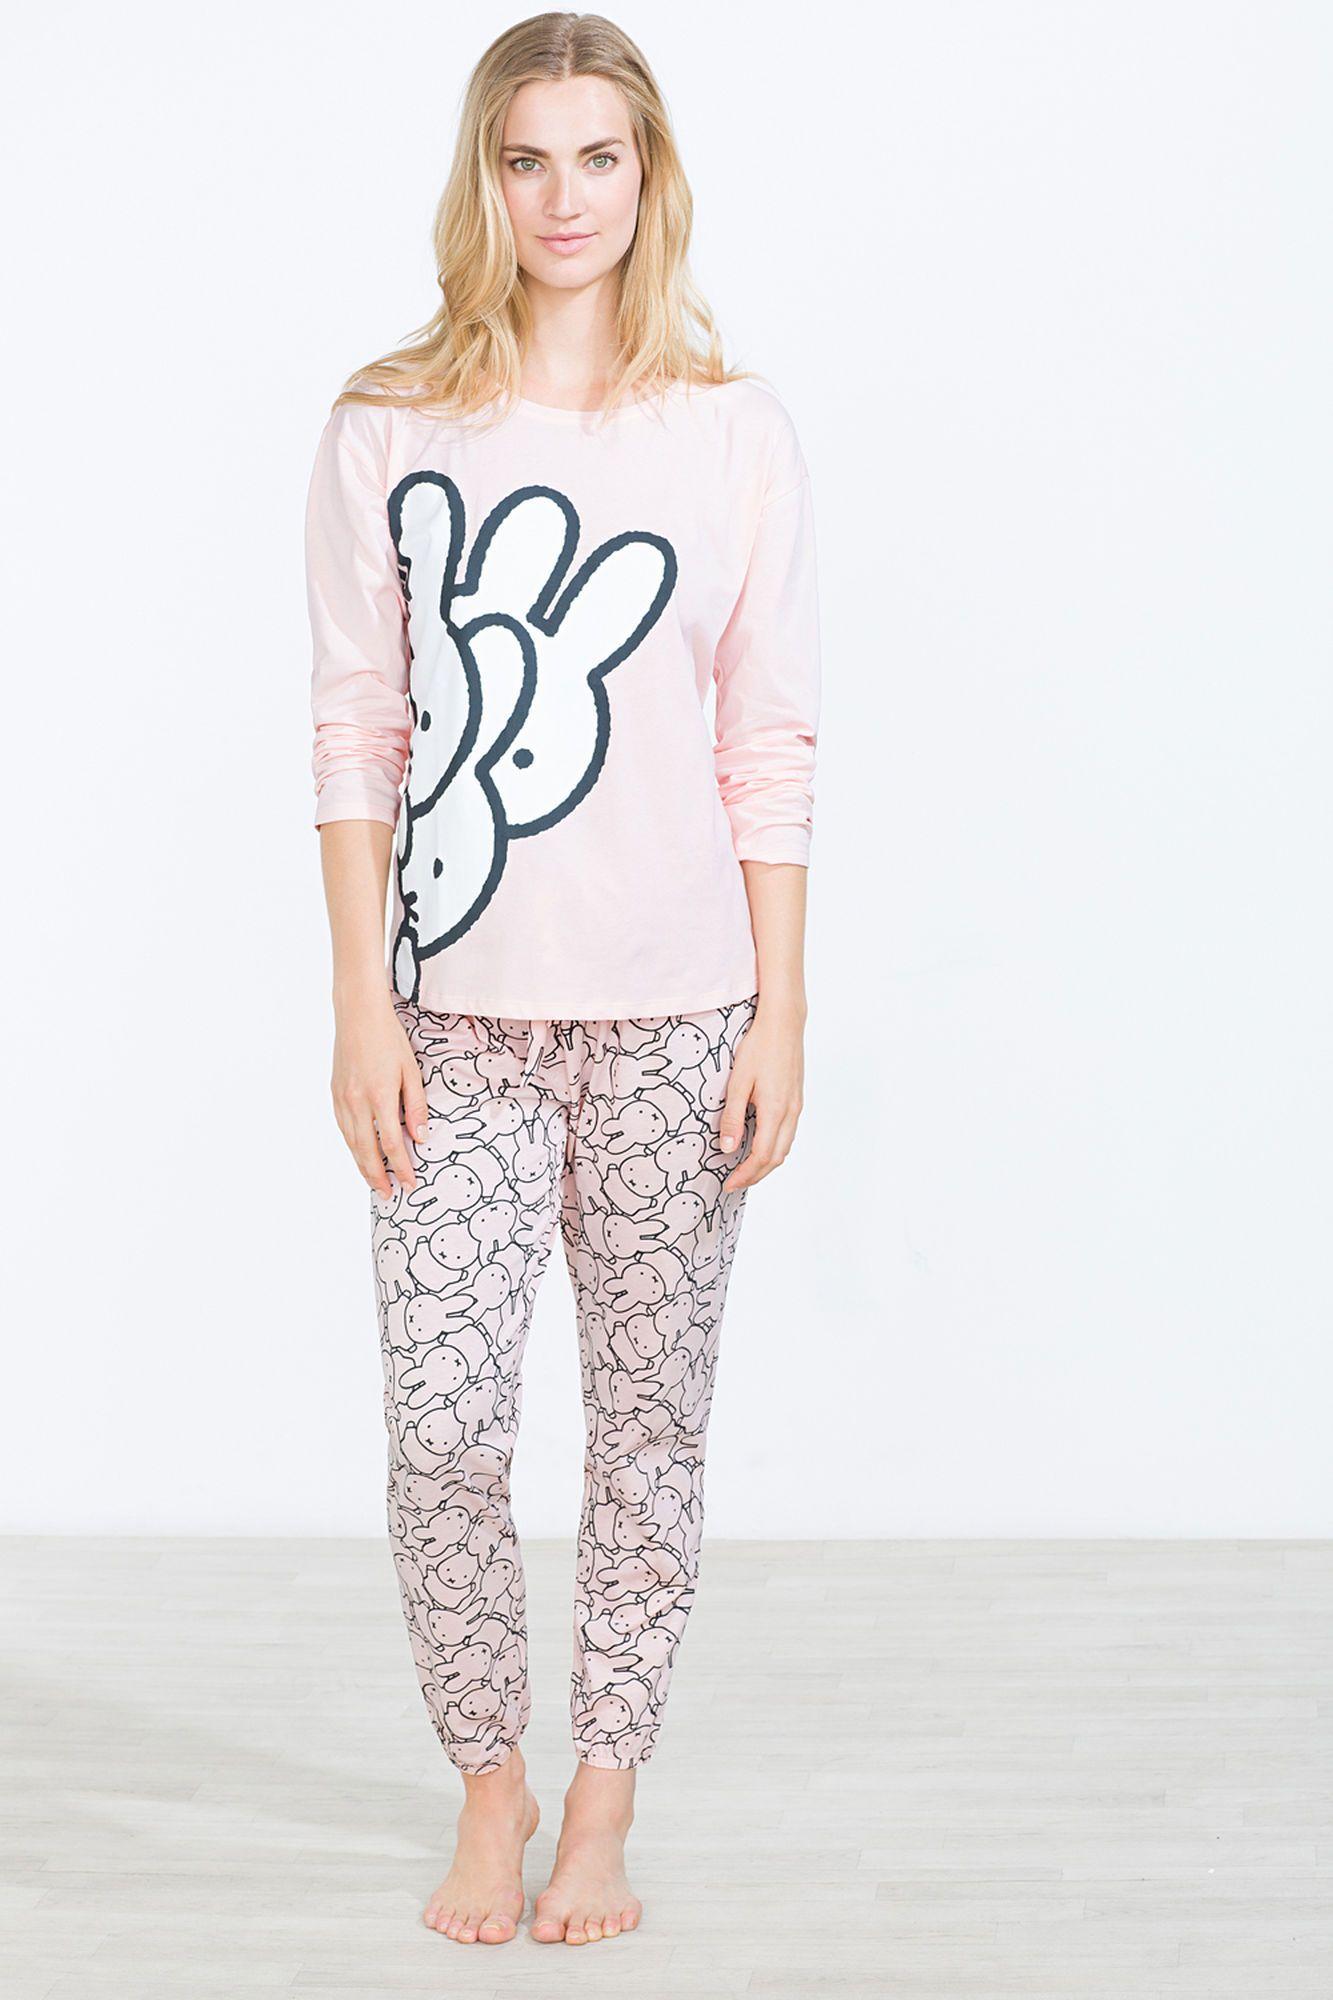 ead969bc9d Pijama largo de Miffy